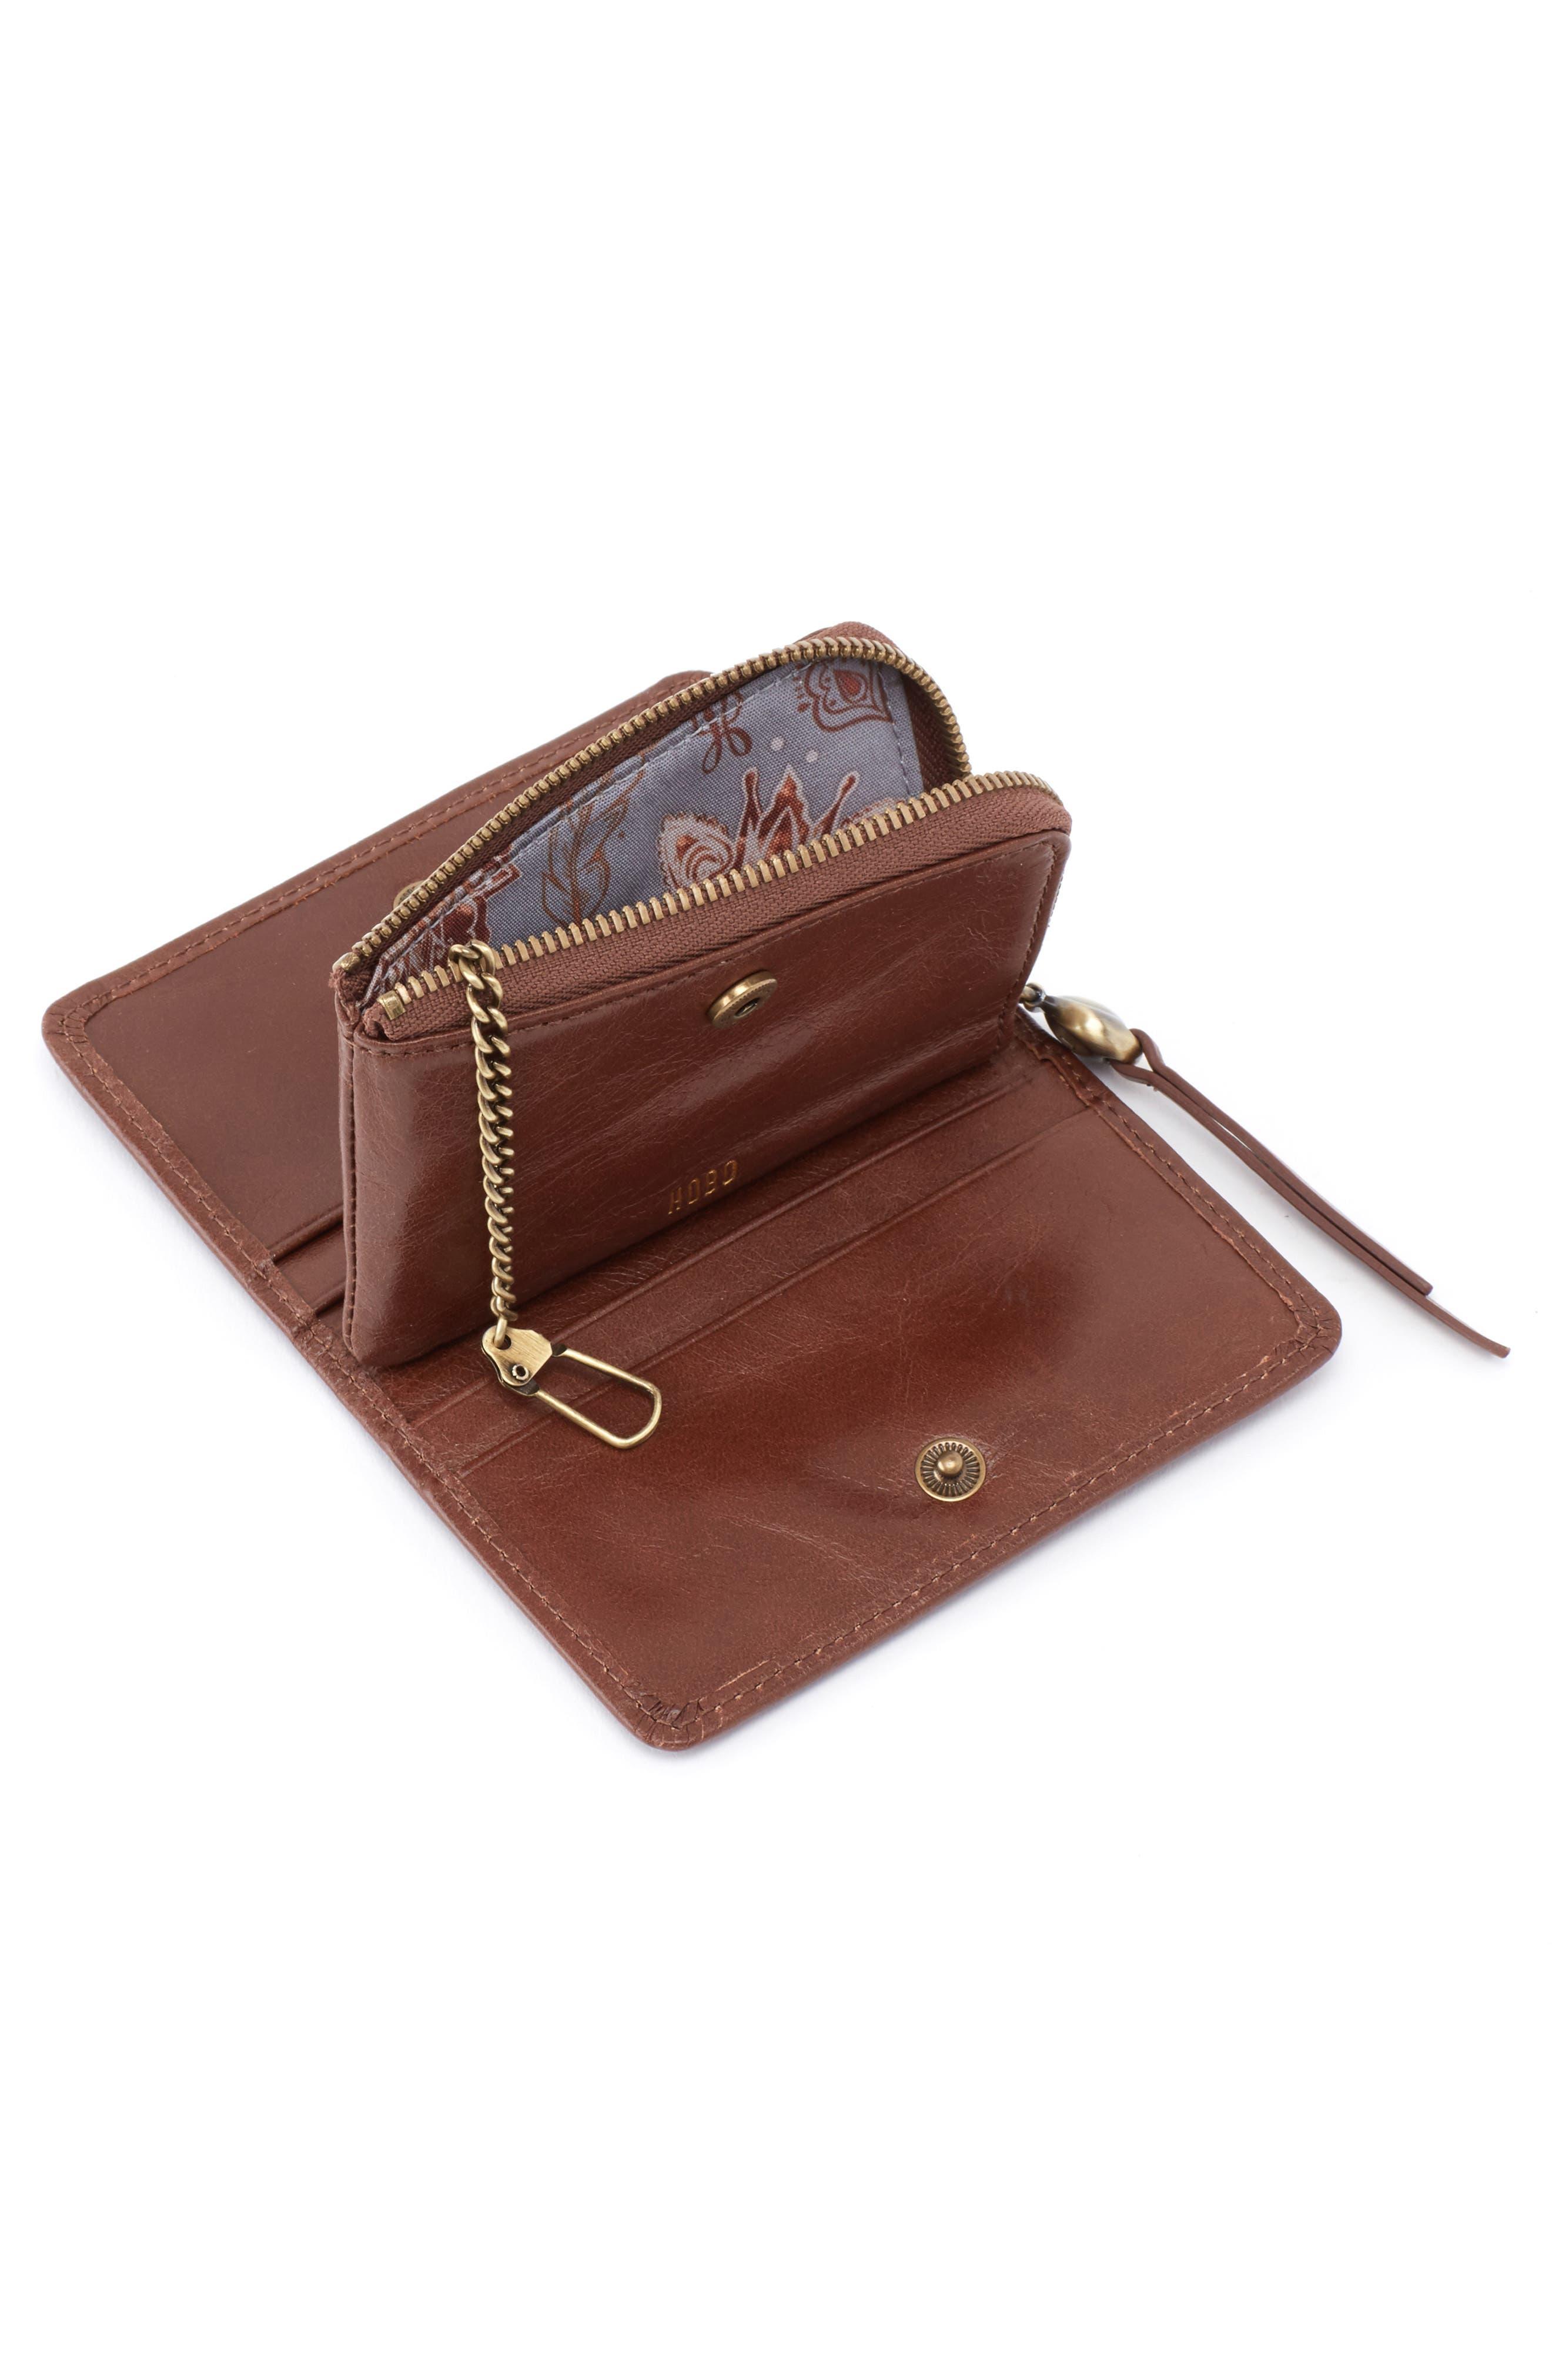 Dart Calfskin Leather Wallet,                             Alternate thumbnail 2, color,                             WOODLANDS